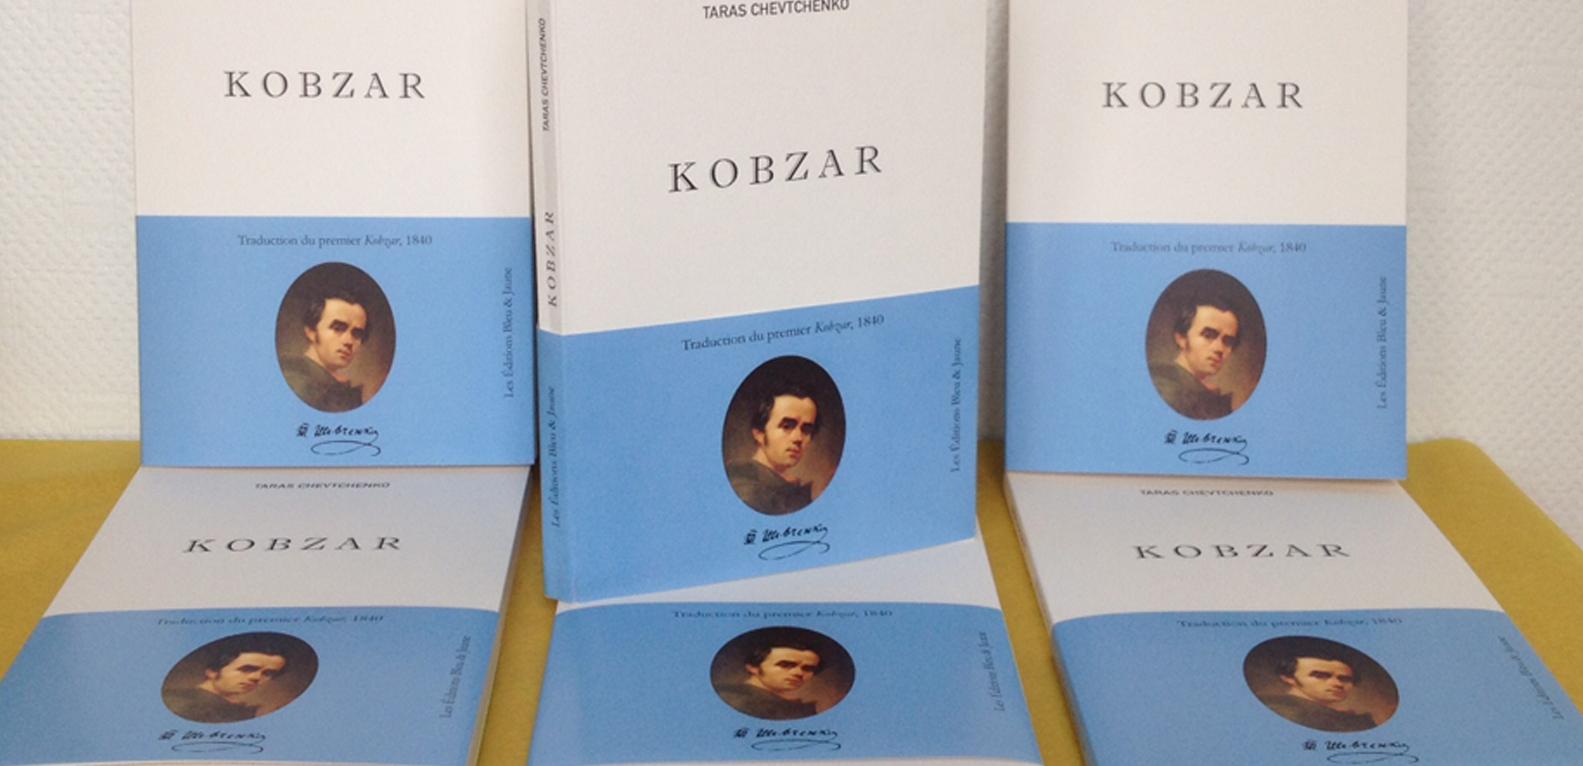 Taras Chevtchenko, Kobzar, Editions Bleu et Jaune, Paris